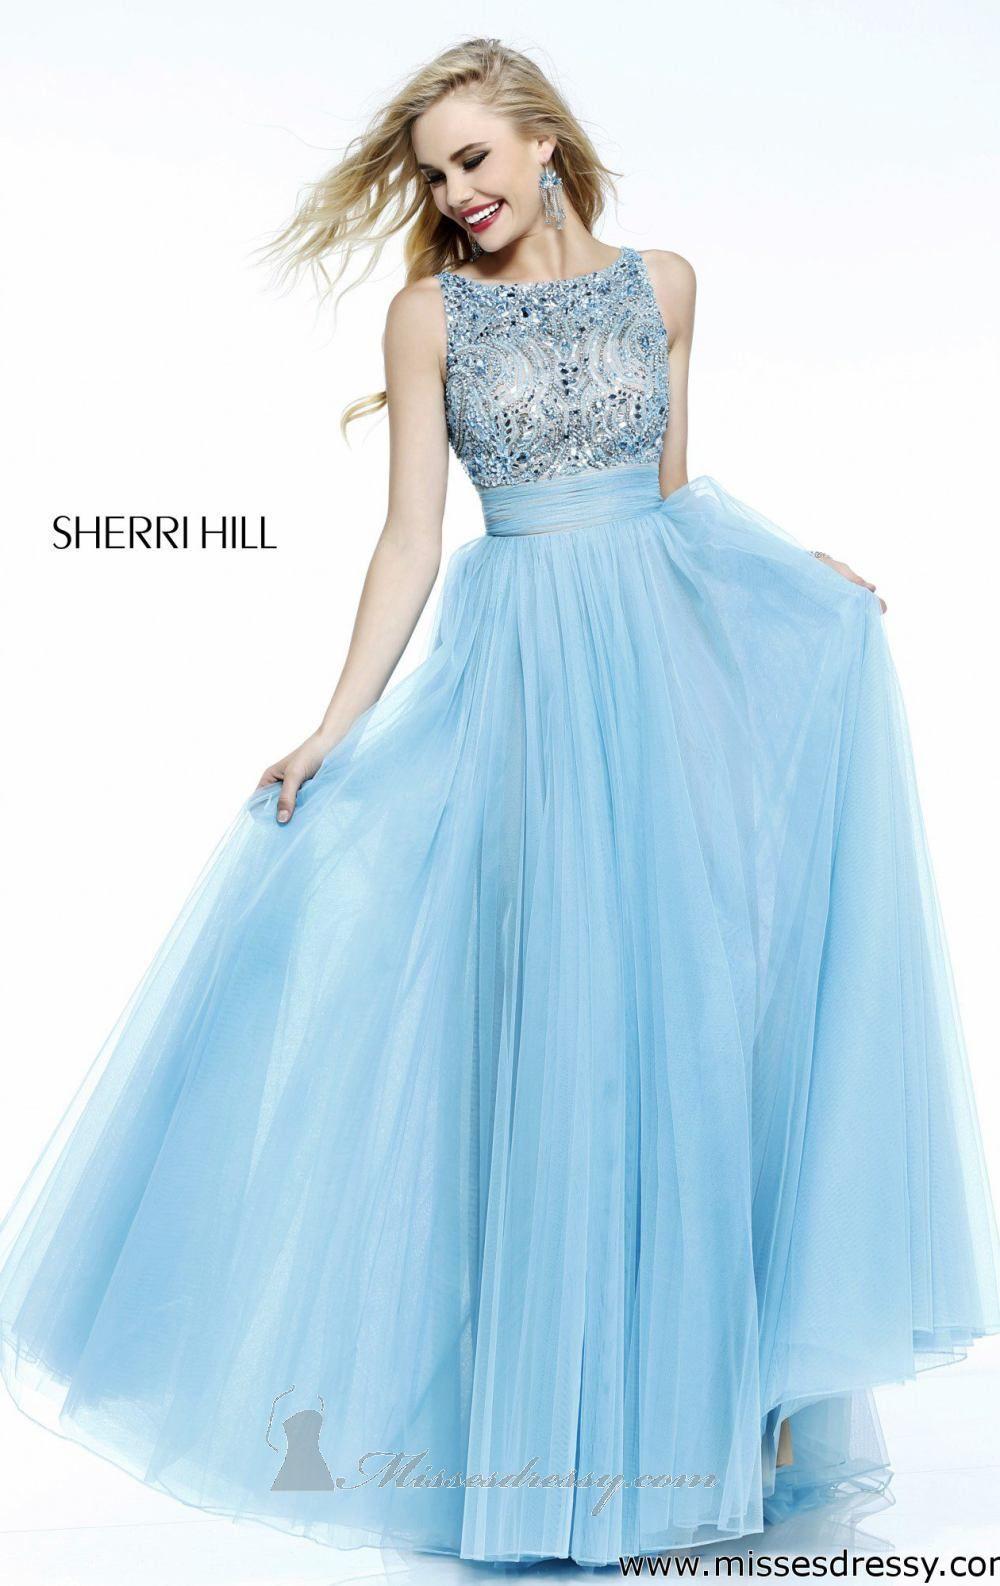 Sherri Hill 11022 by Sherri Hill - Dress Option 2 | Prom | Pinterest ...